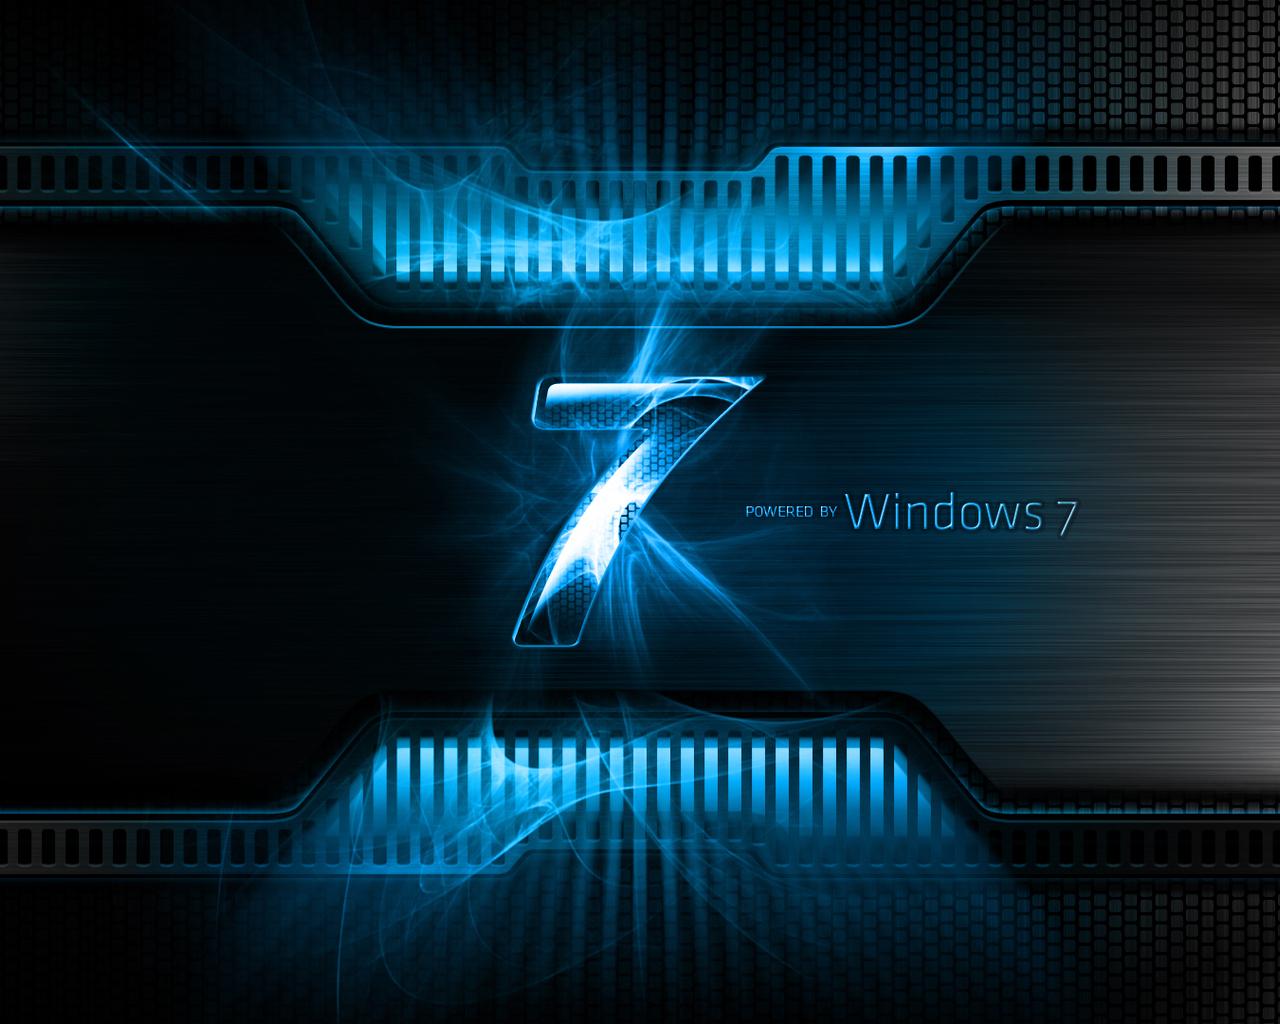 http://4.bp.blogspot.com/-JecTbCjh6K8/T57X9XiUbUI/AAAAAAAAFPY/m4MYeH-Db4Y/s1600/Hi-Tech-Windows7-1280x1024.jpg